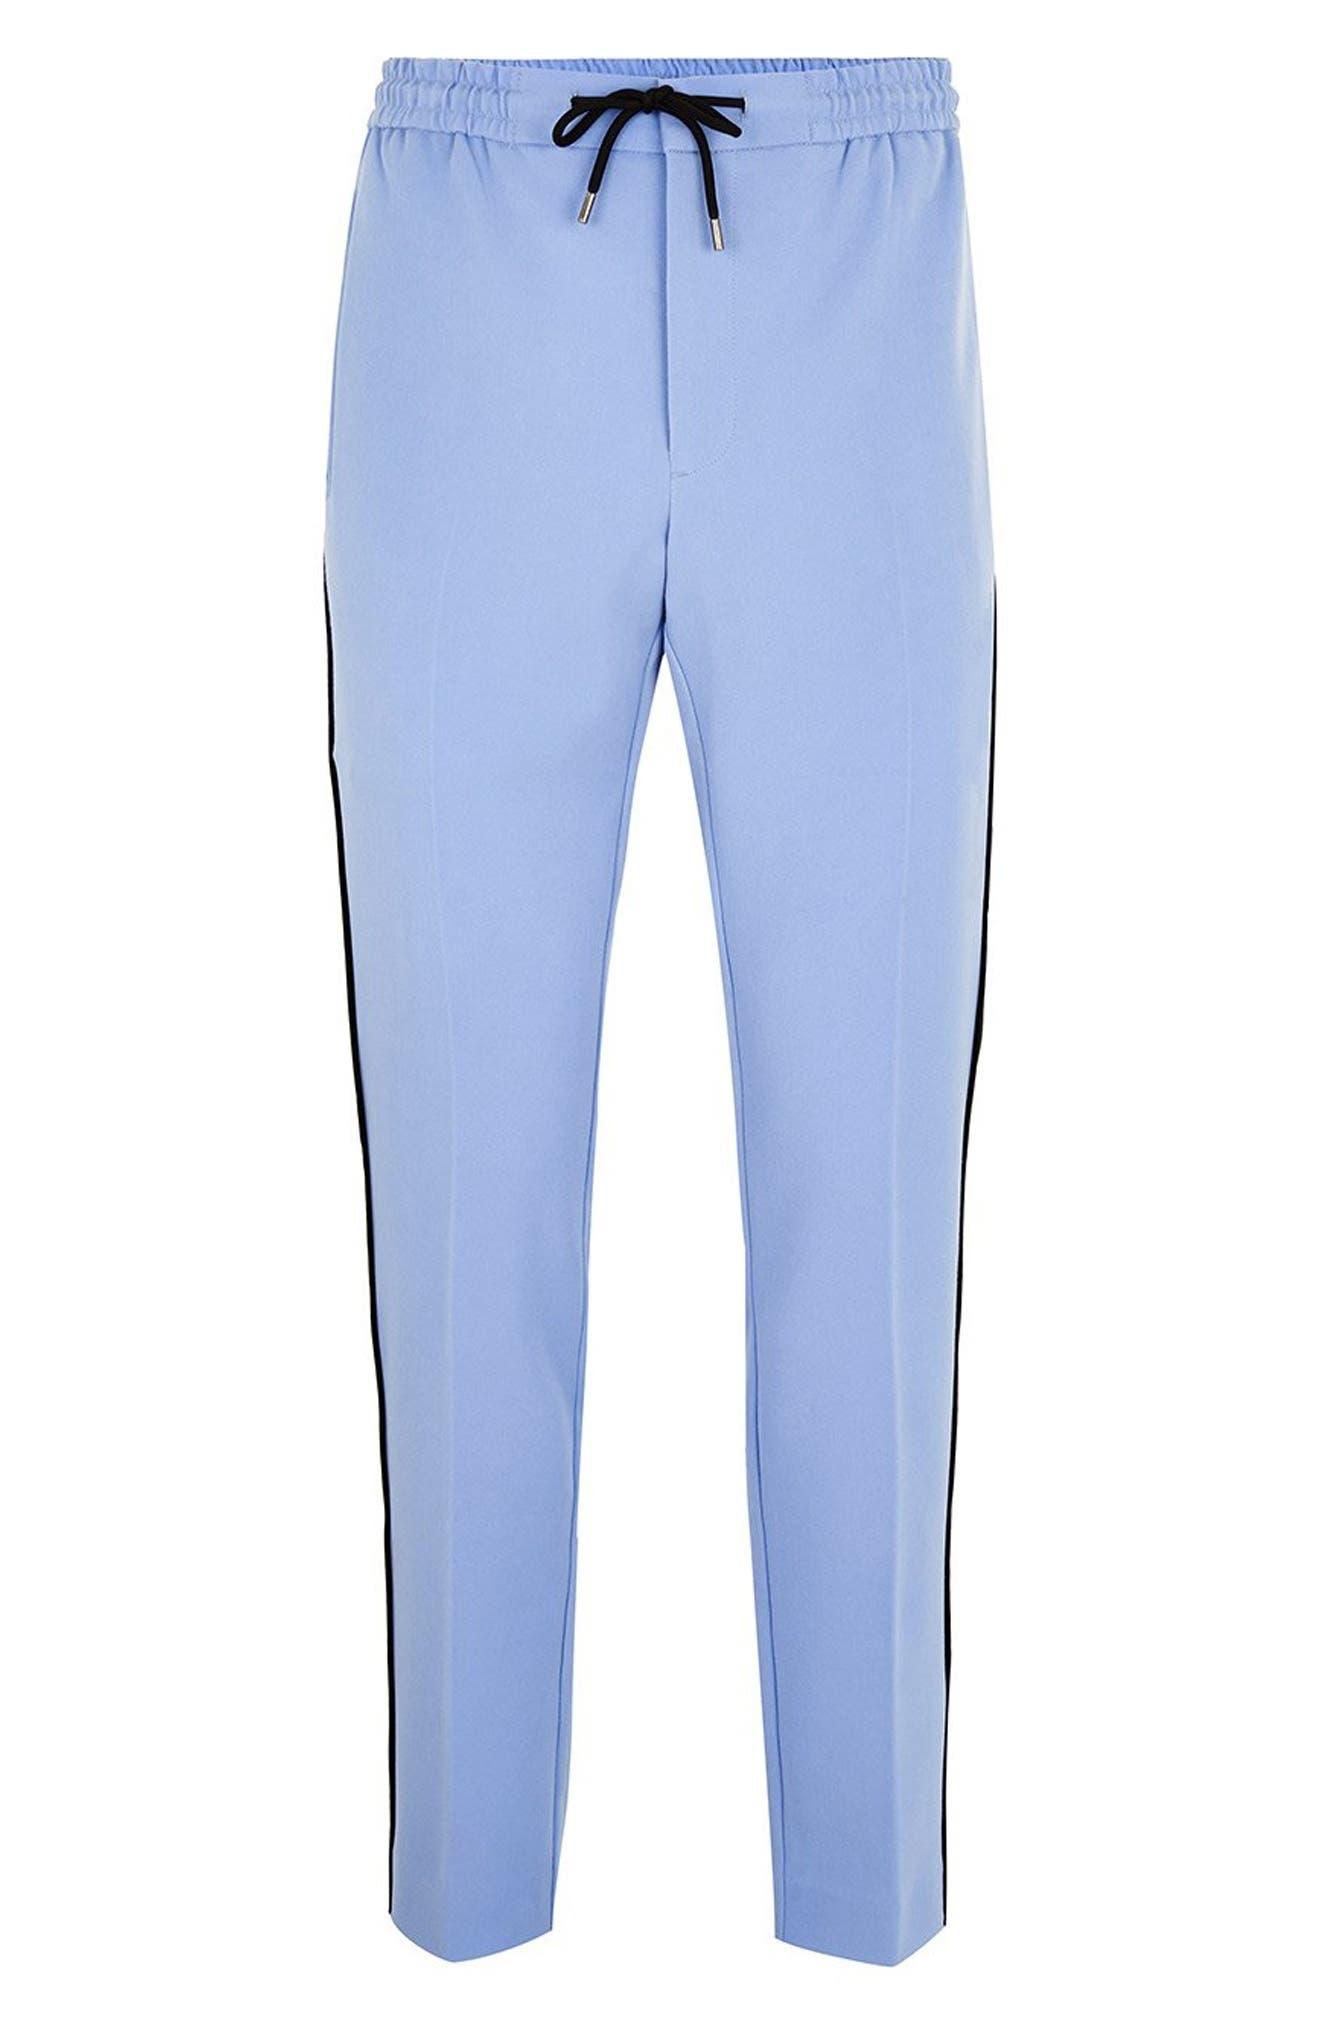 Binding Skinny Fit Jogger Pants,                             Alternate thumbnail 5, color,                             400